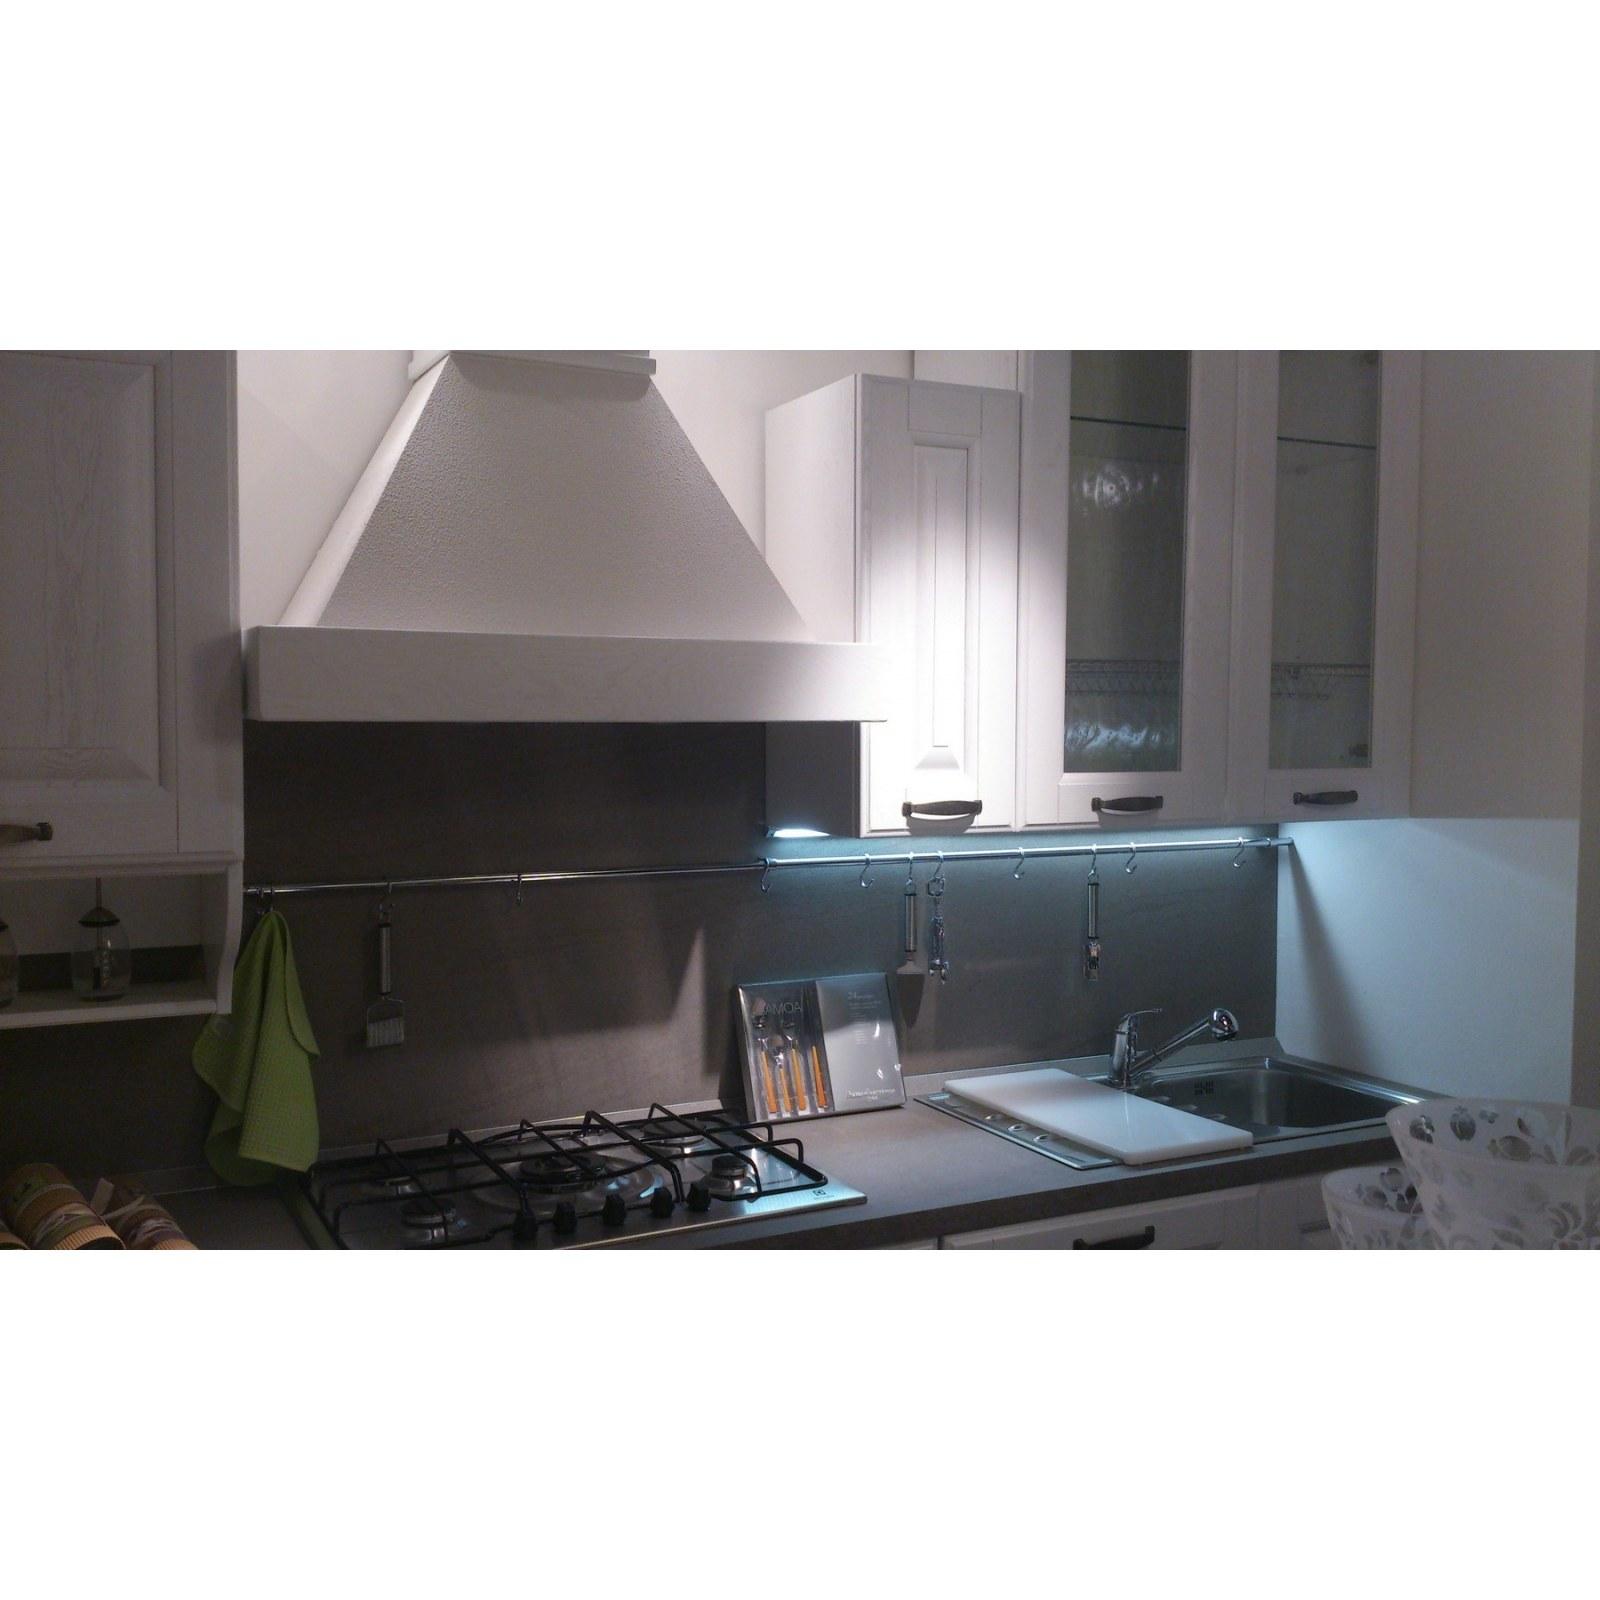 Cucina paola decap la casa moderna mariotti casa - La cucina moderna ...